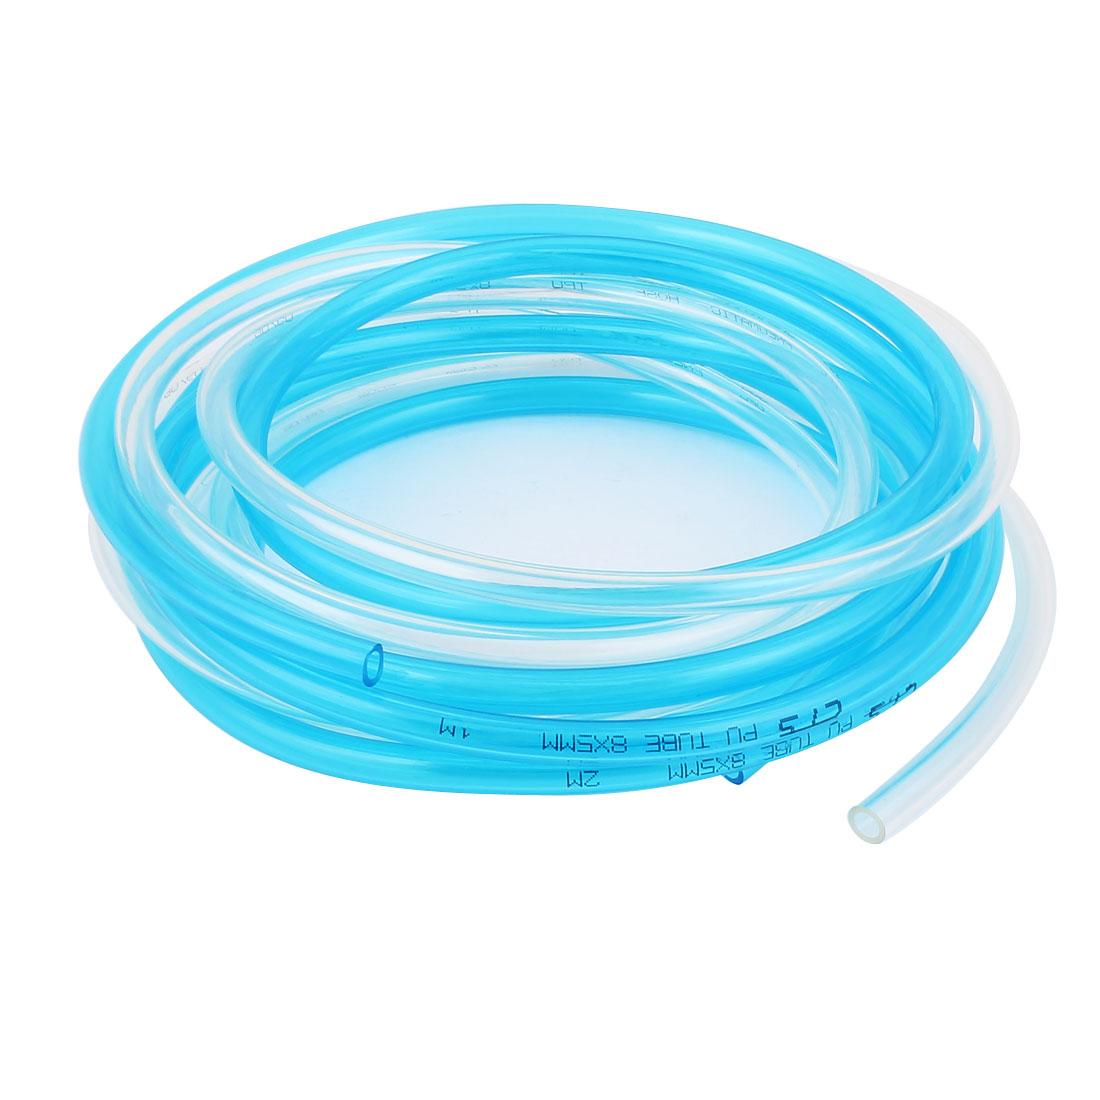 PU Polyurethane Flexible Air Tubing Pneumatic Pipe Tube Hose 8x5mm 2.85M 2Pcs